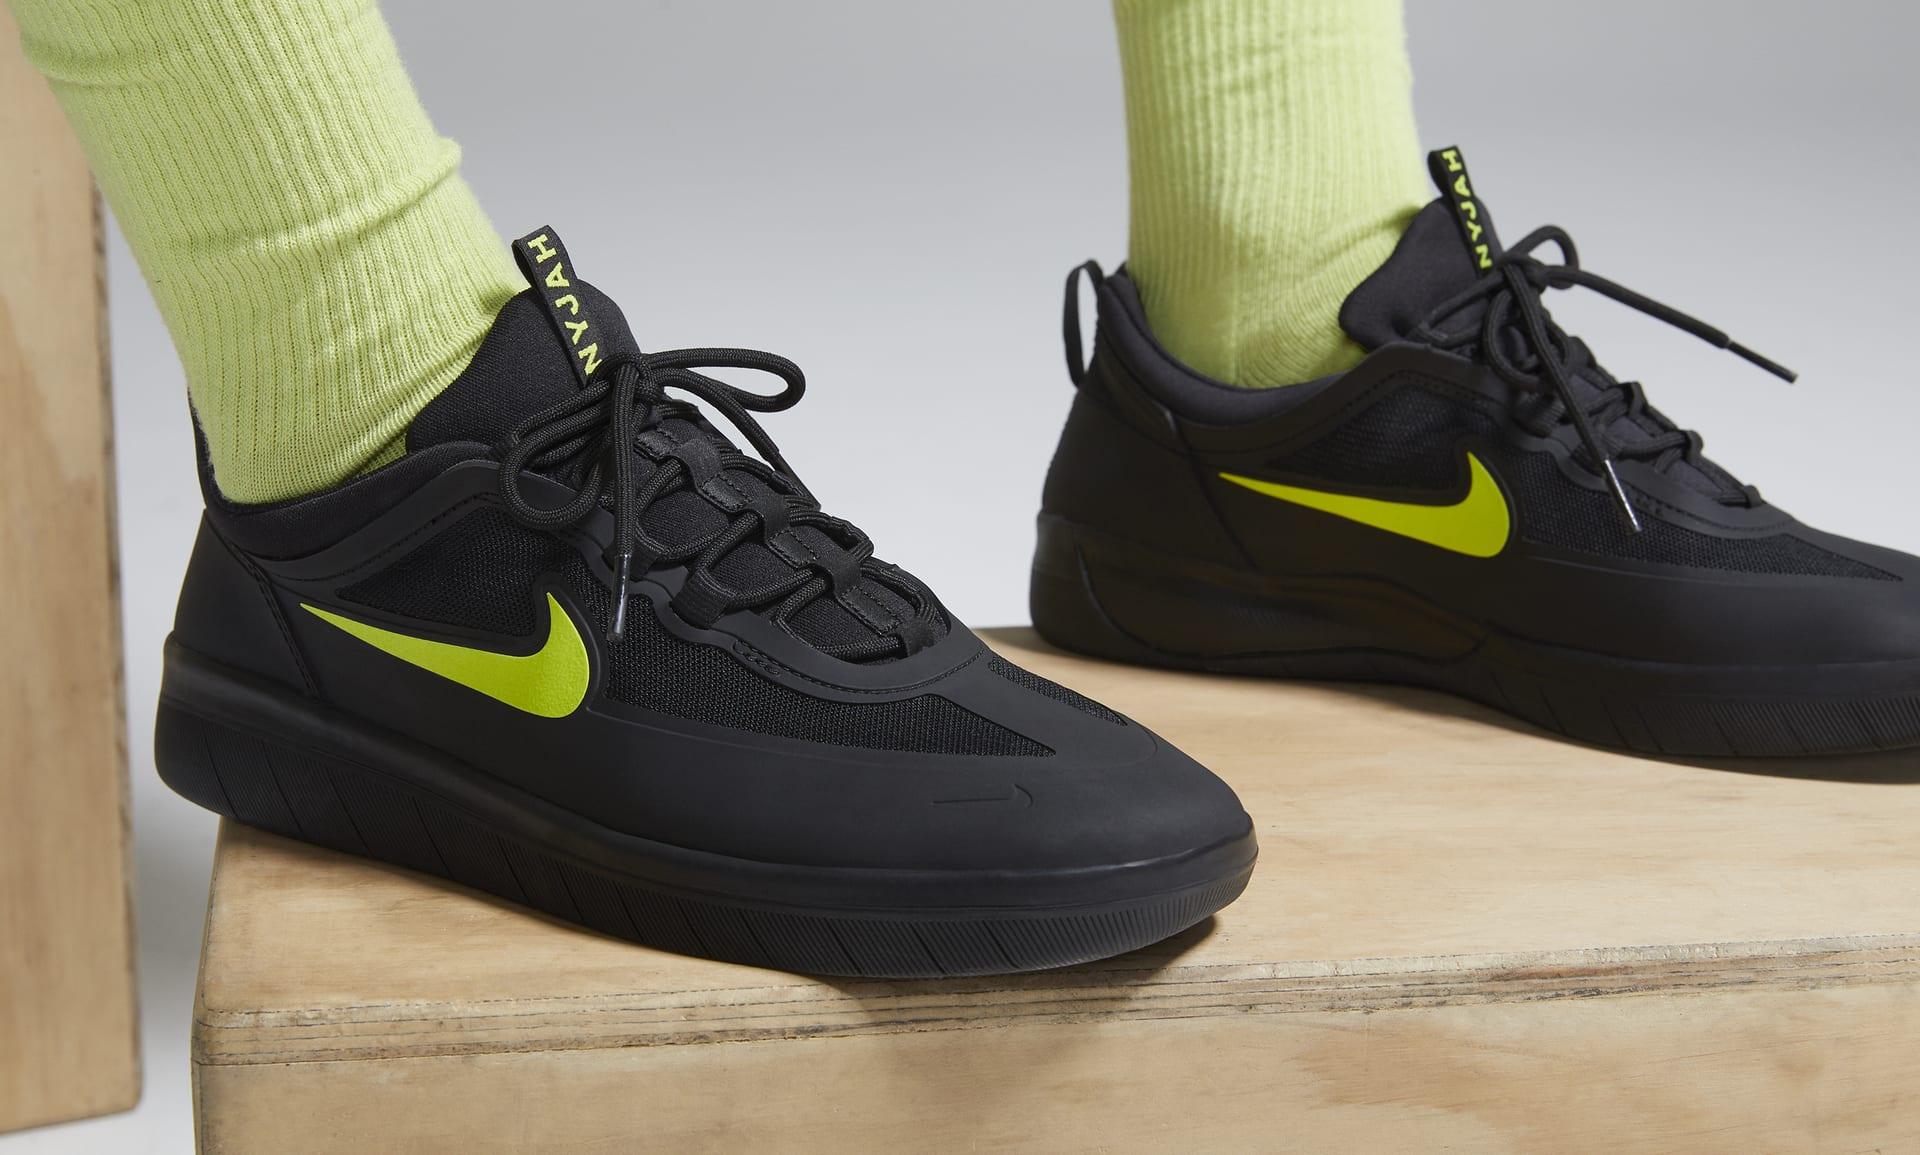 Nike SB Nyjah Free 2 Skate Shoes. Nike.com